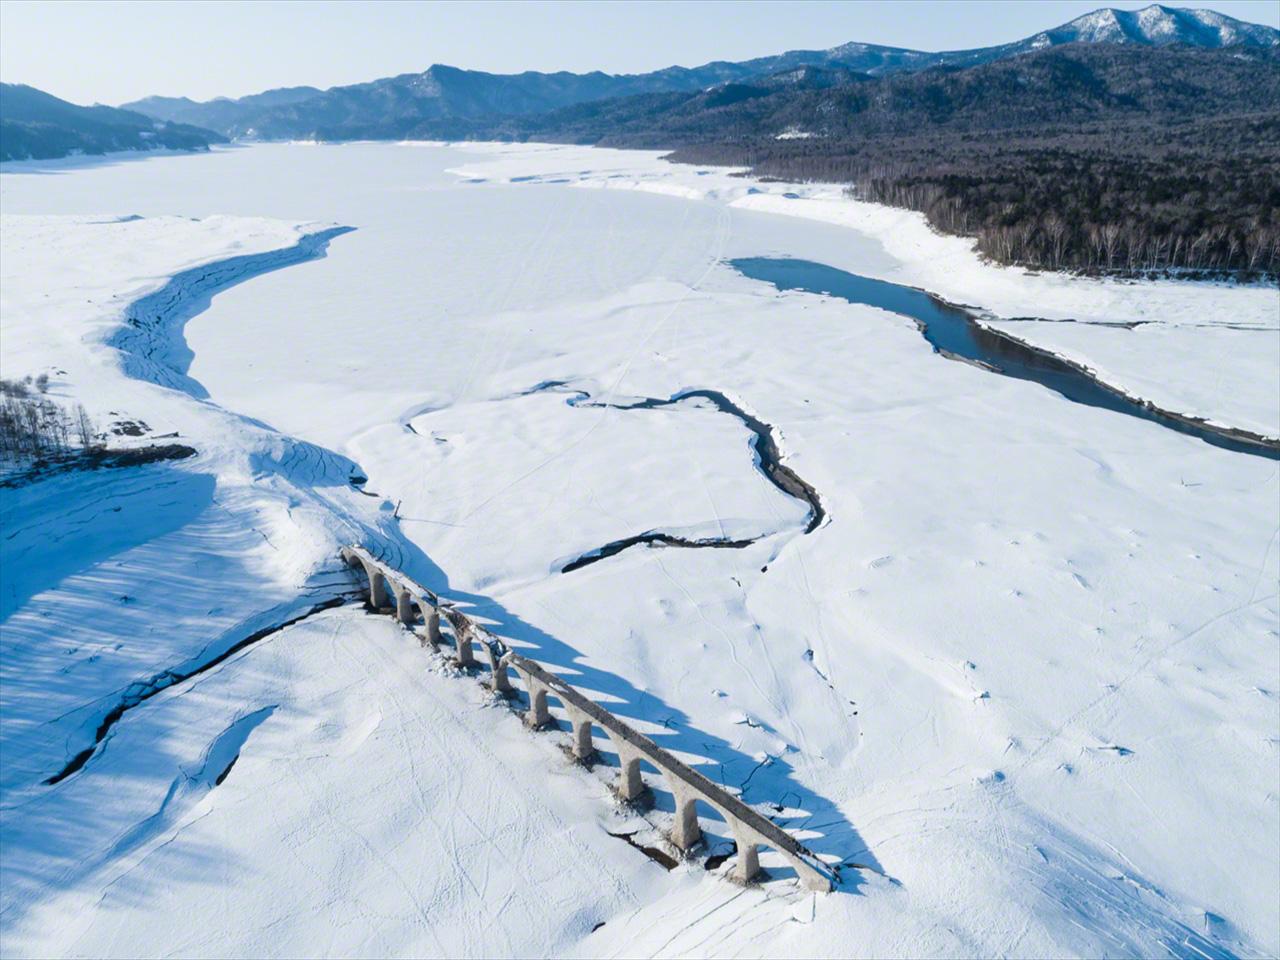 Pada bulan Maret, es dan salju menutupi Danau Nukabira. Sungai Otofuke terlihat mengalir di sebelah kanan.